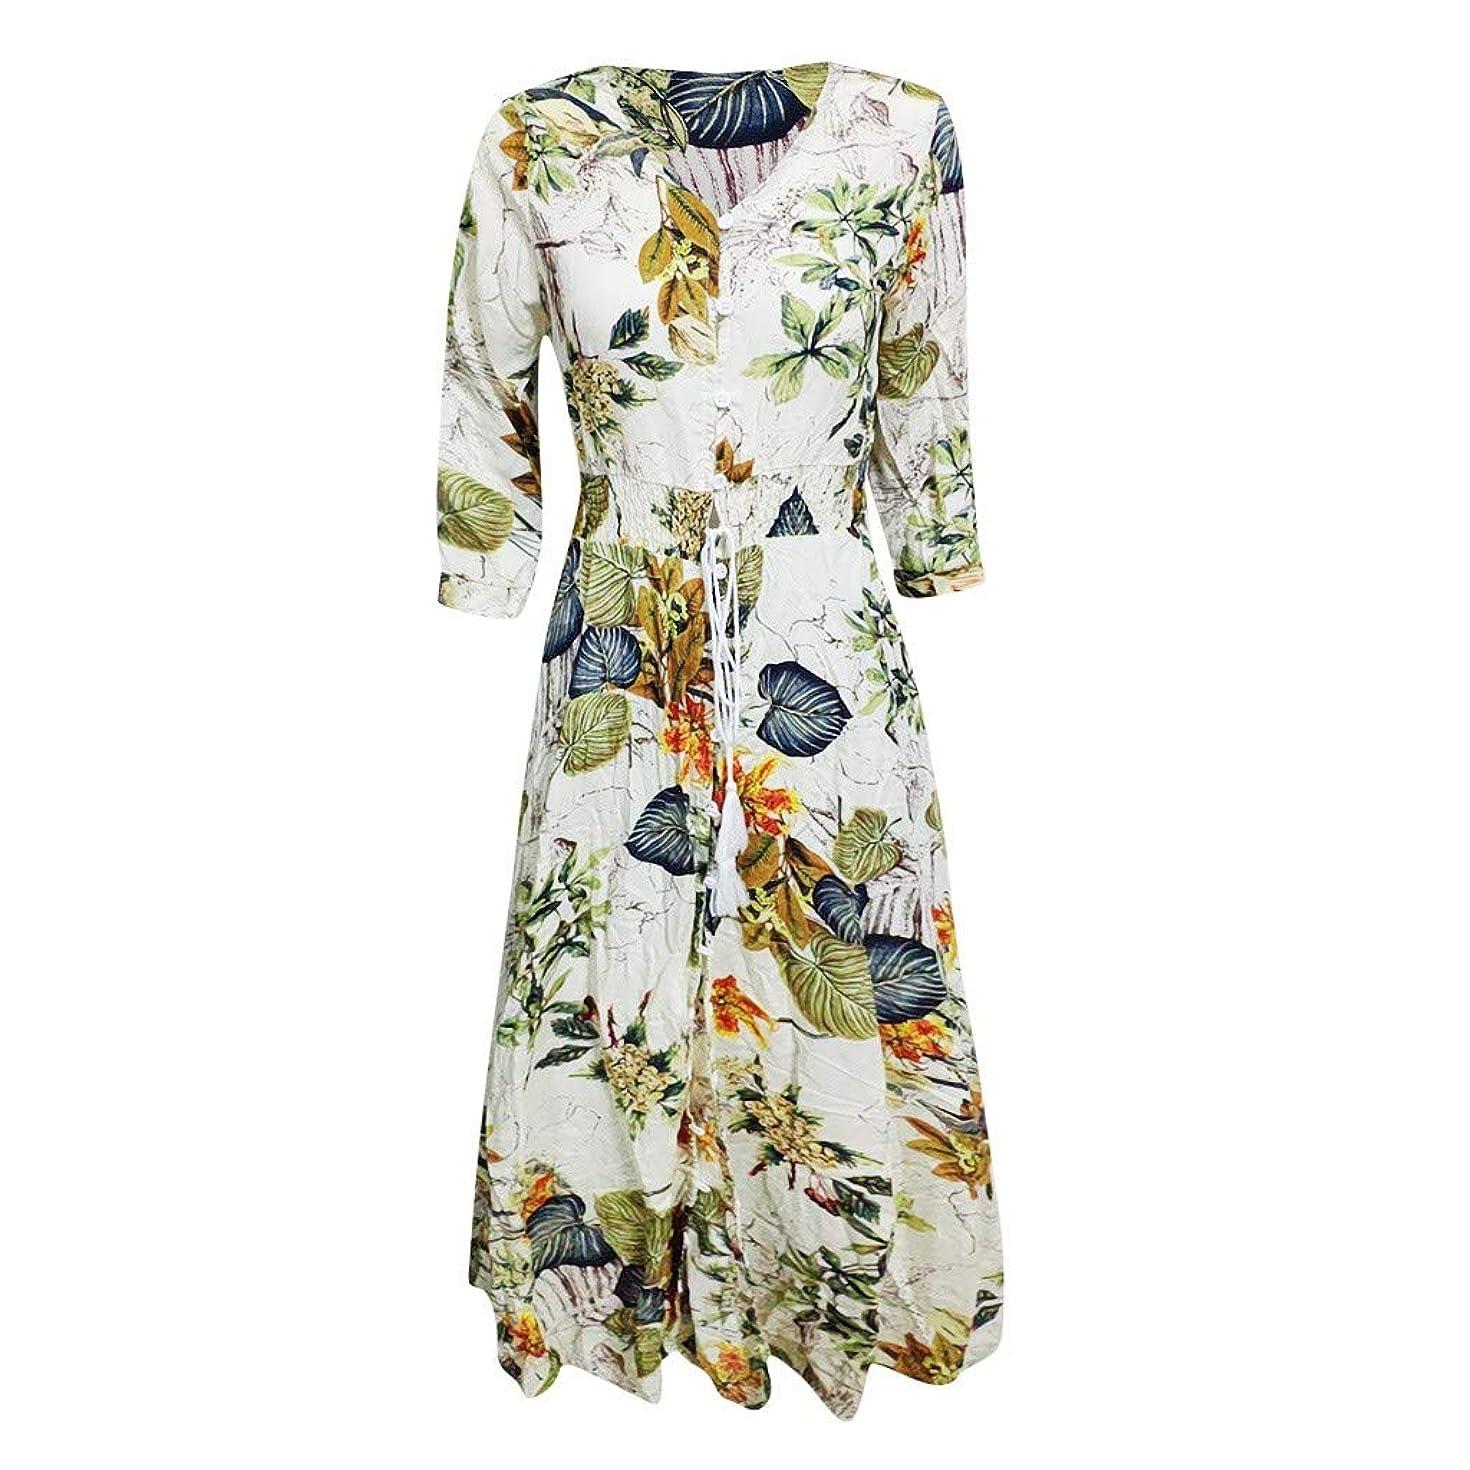 Women's Bohemian Floral Printed Wrap V Neck Short Sleeve Button Up Long Dresses Split Flowy Beach Party Maxi Dress